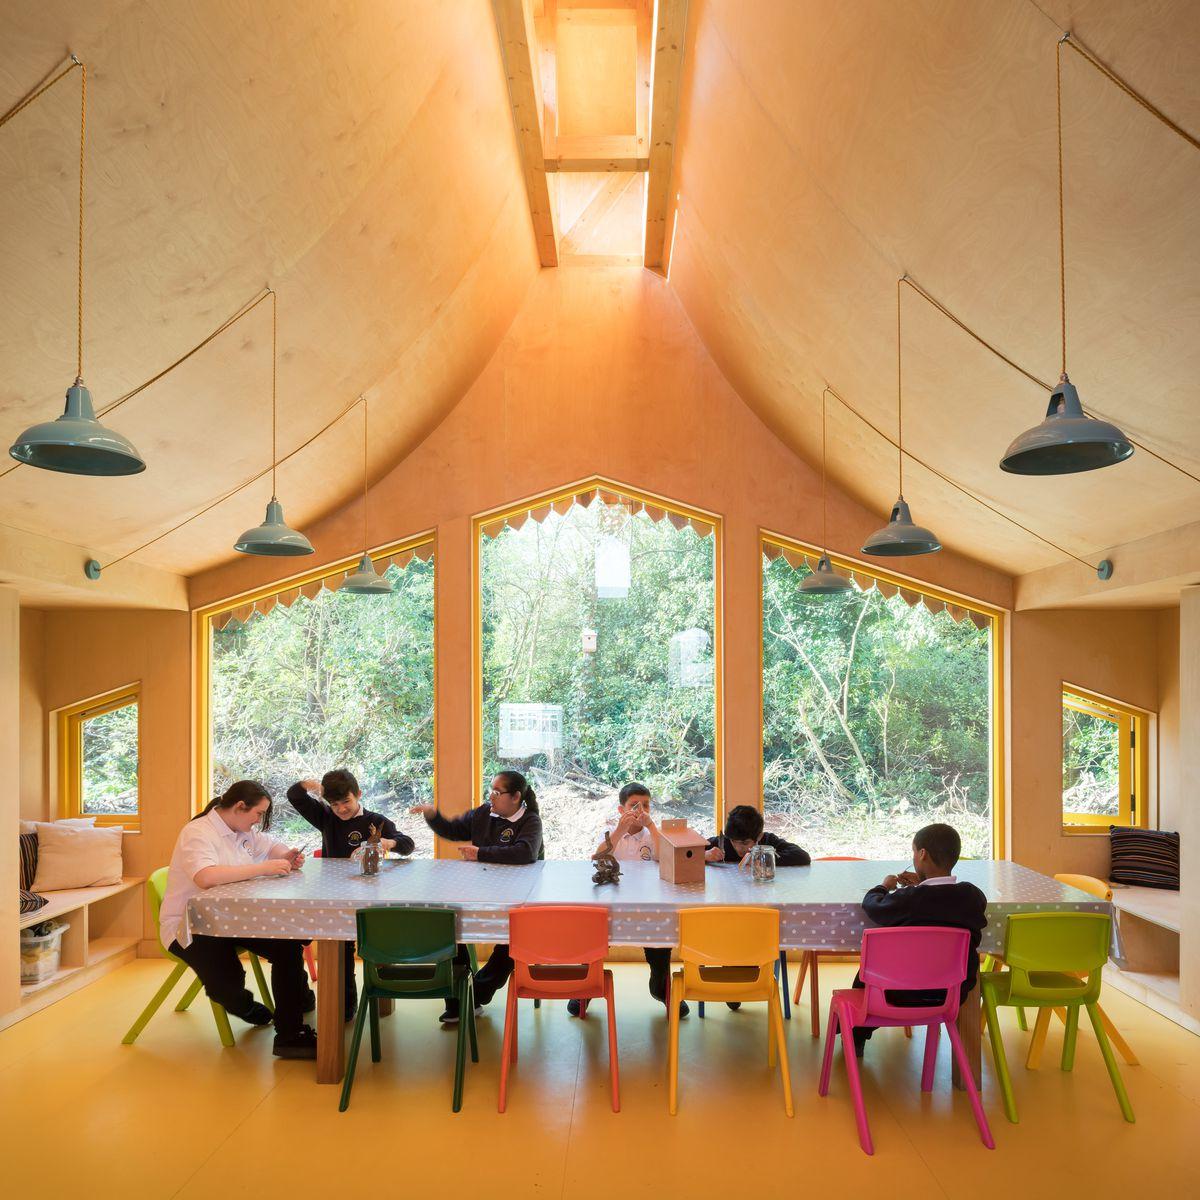 School children sitting inside school on colorful chairs